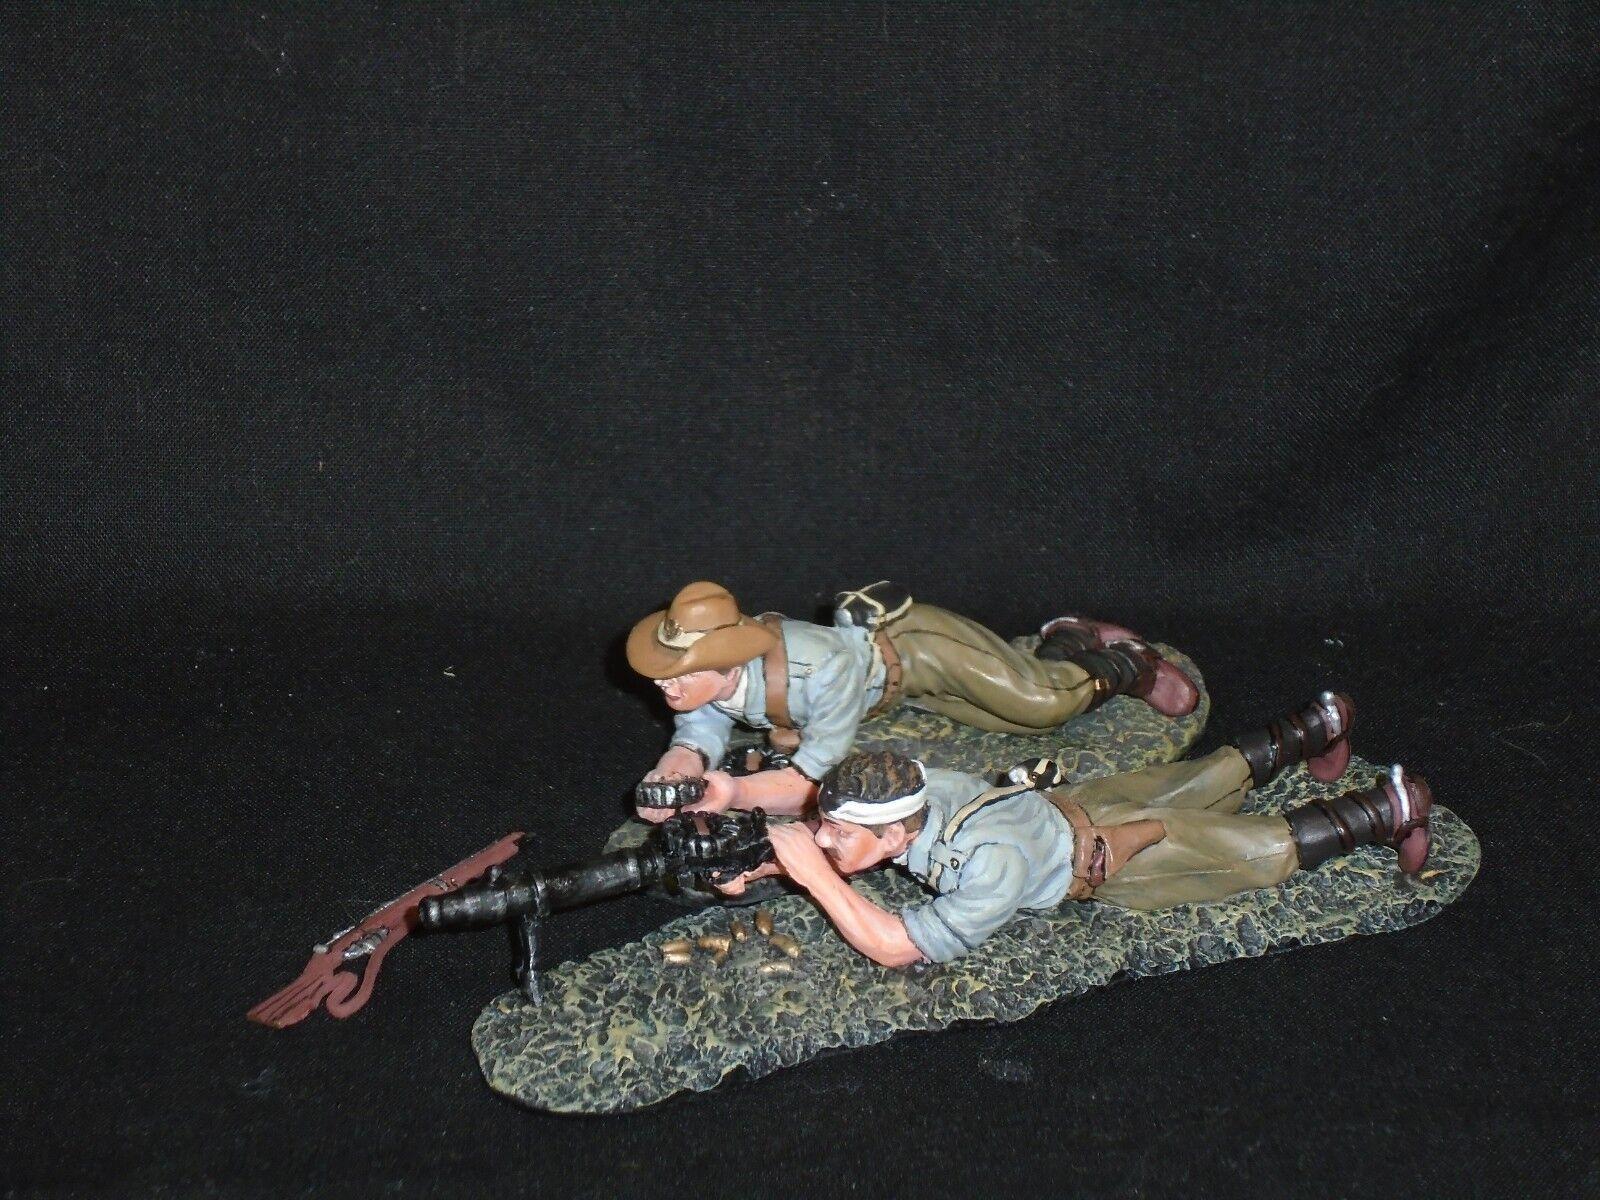 THOMAS GUNN ALH003 WWII BRITISH LEWIS GUN TEAM.